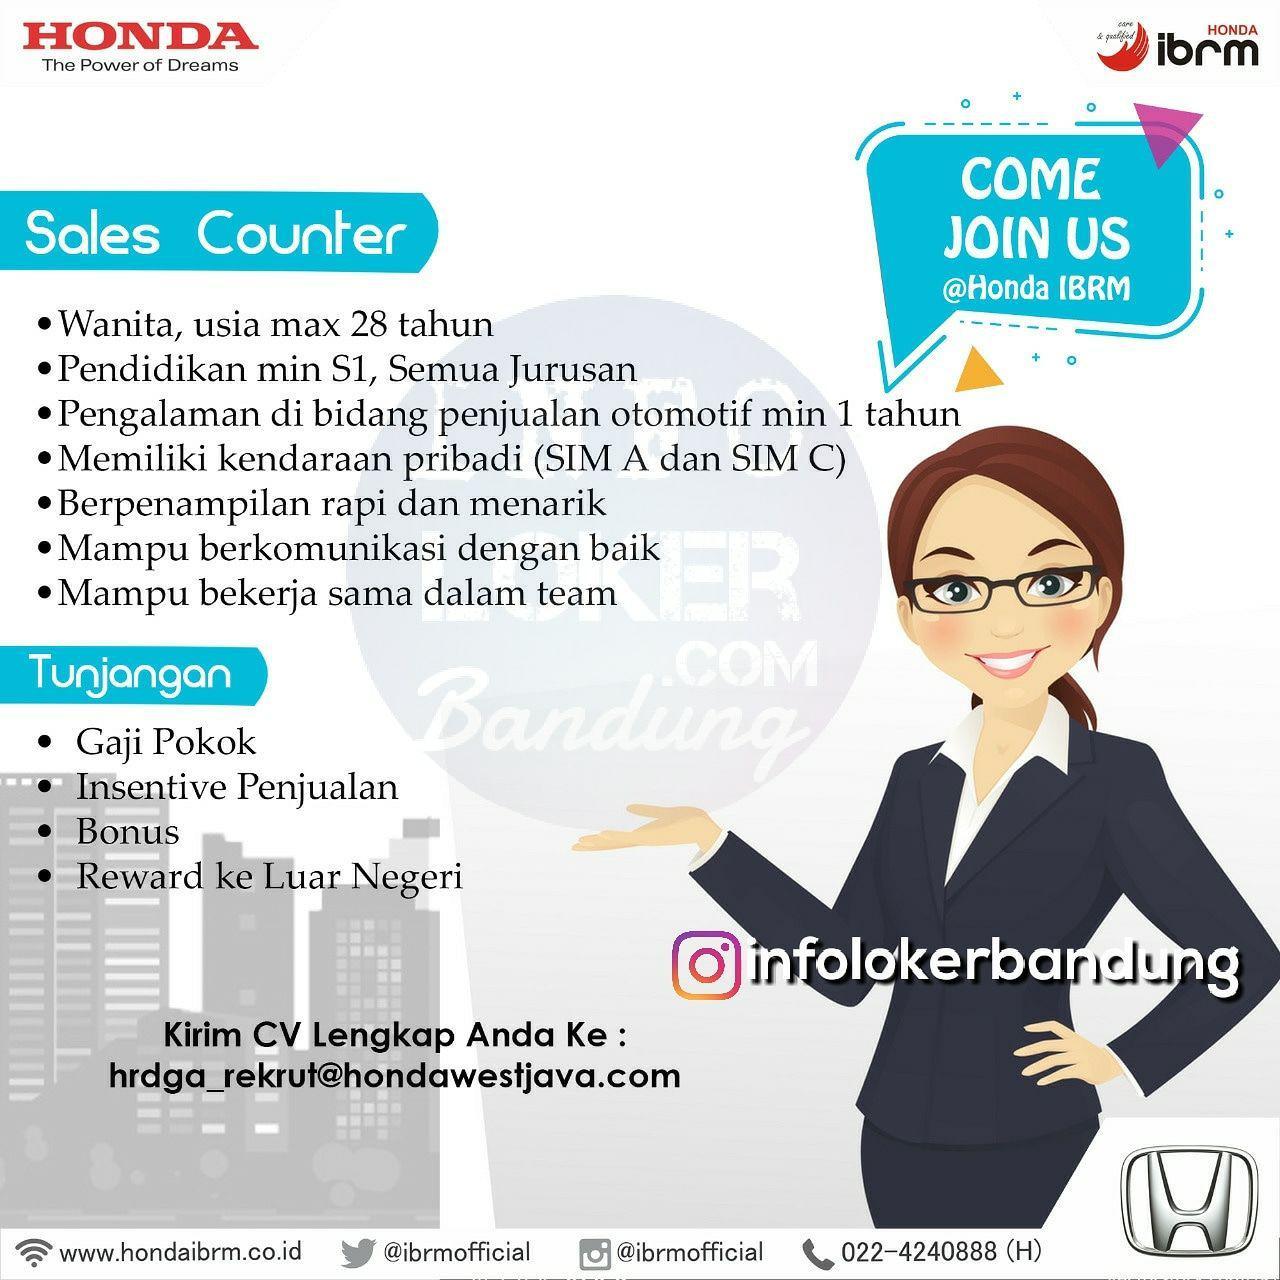 Lowongan Kerja Sales Counter Honda IBRM Bandung Maret 2018